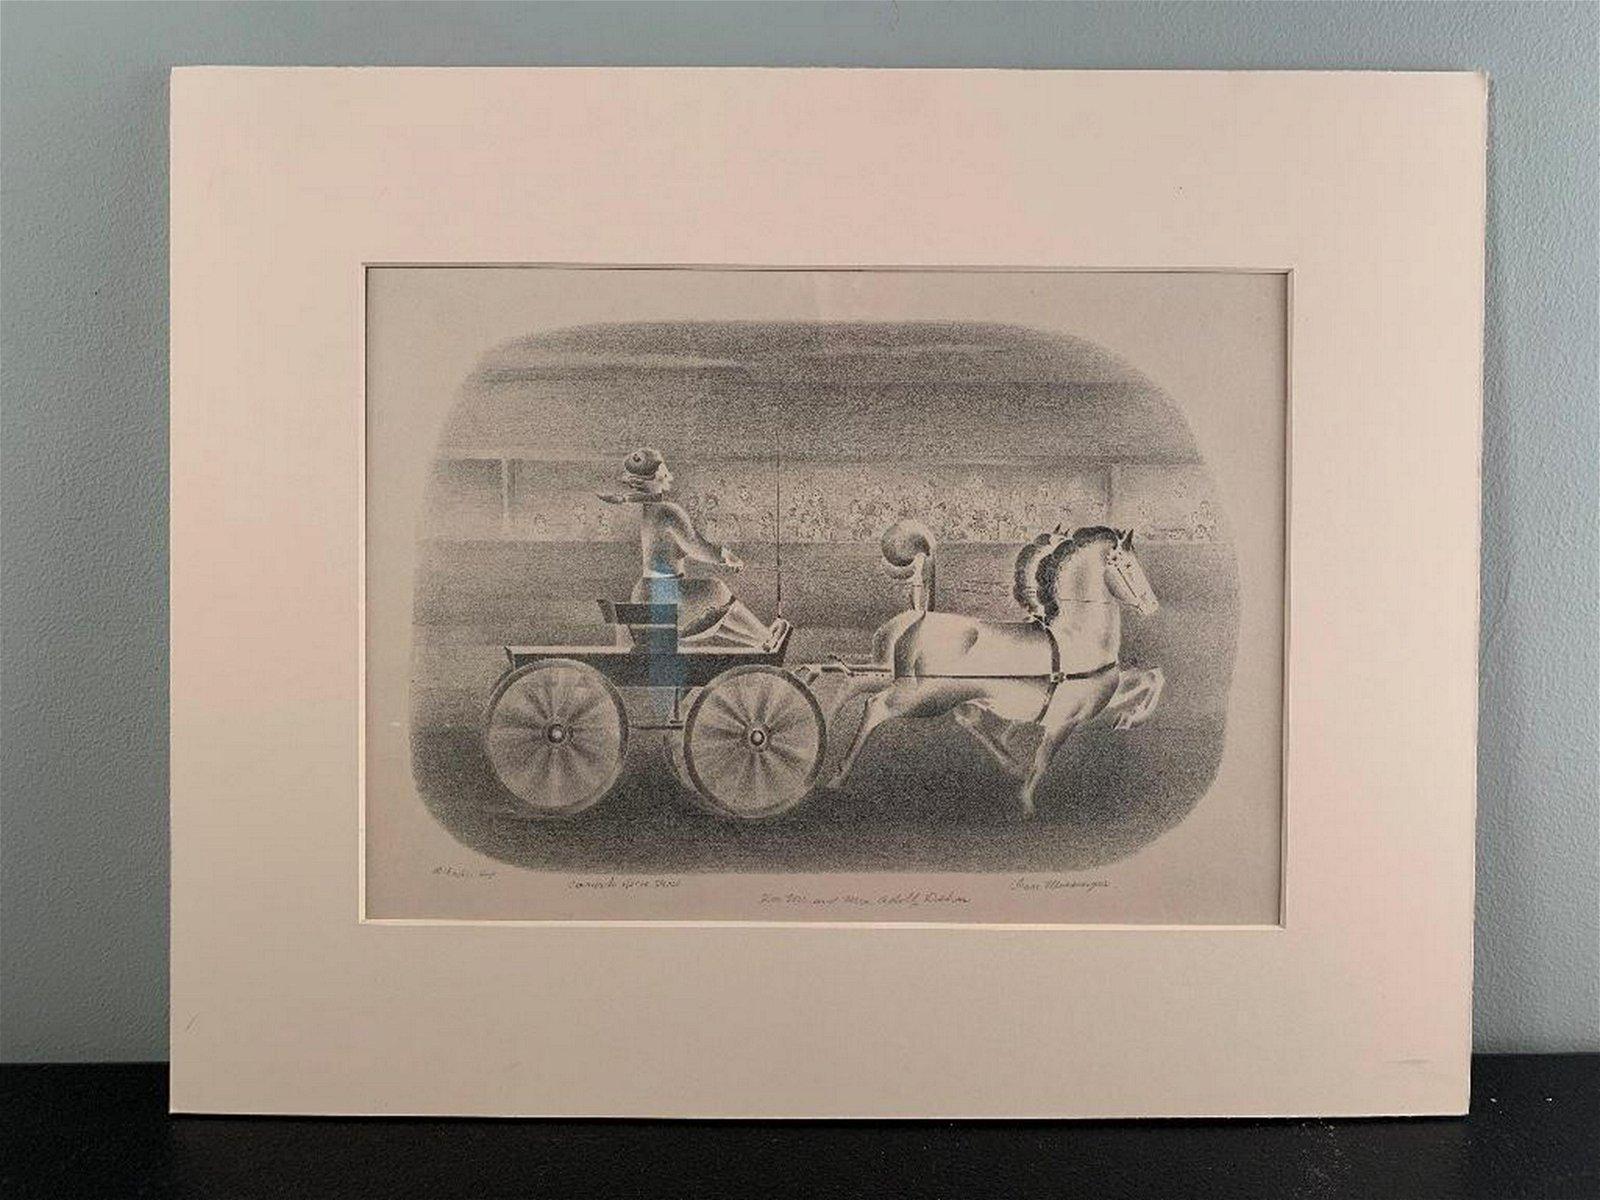 Ivan Messenger(American 1895-1983) Coronado Horse Show,